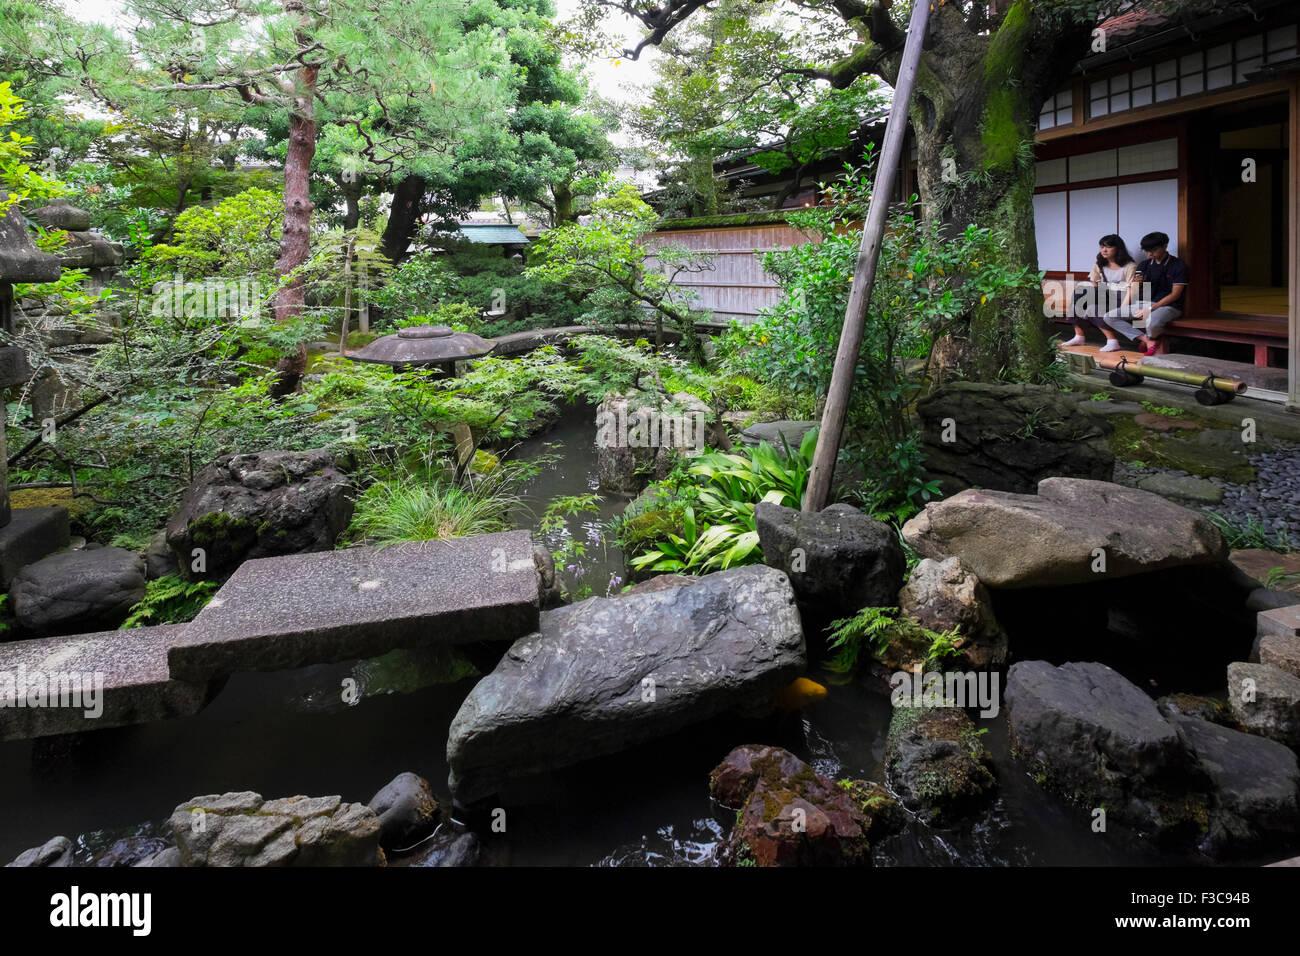 Nomura Samurai Family House garden in Nagamachi district of Kanazawa Japan - Stock Image